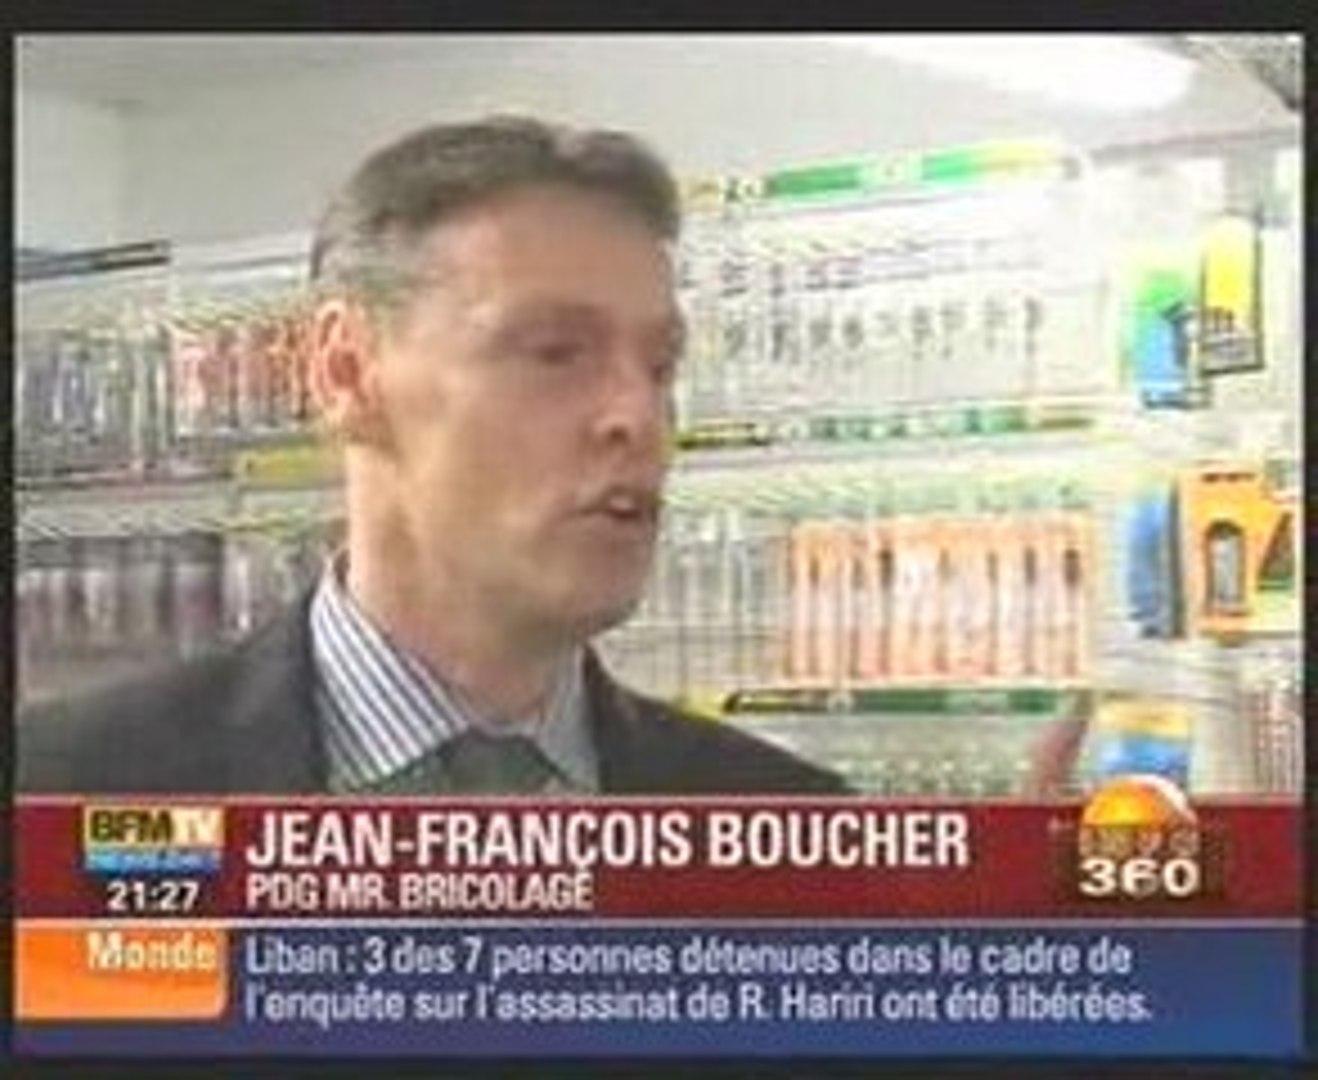 09-02-25 BFM TV Entretien JF Boucher